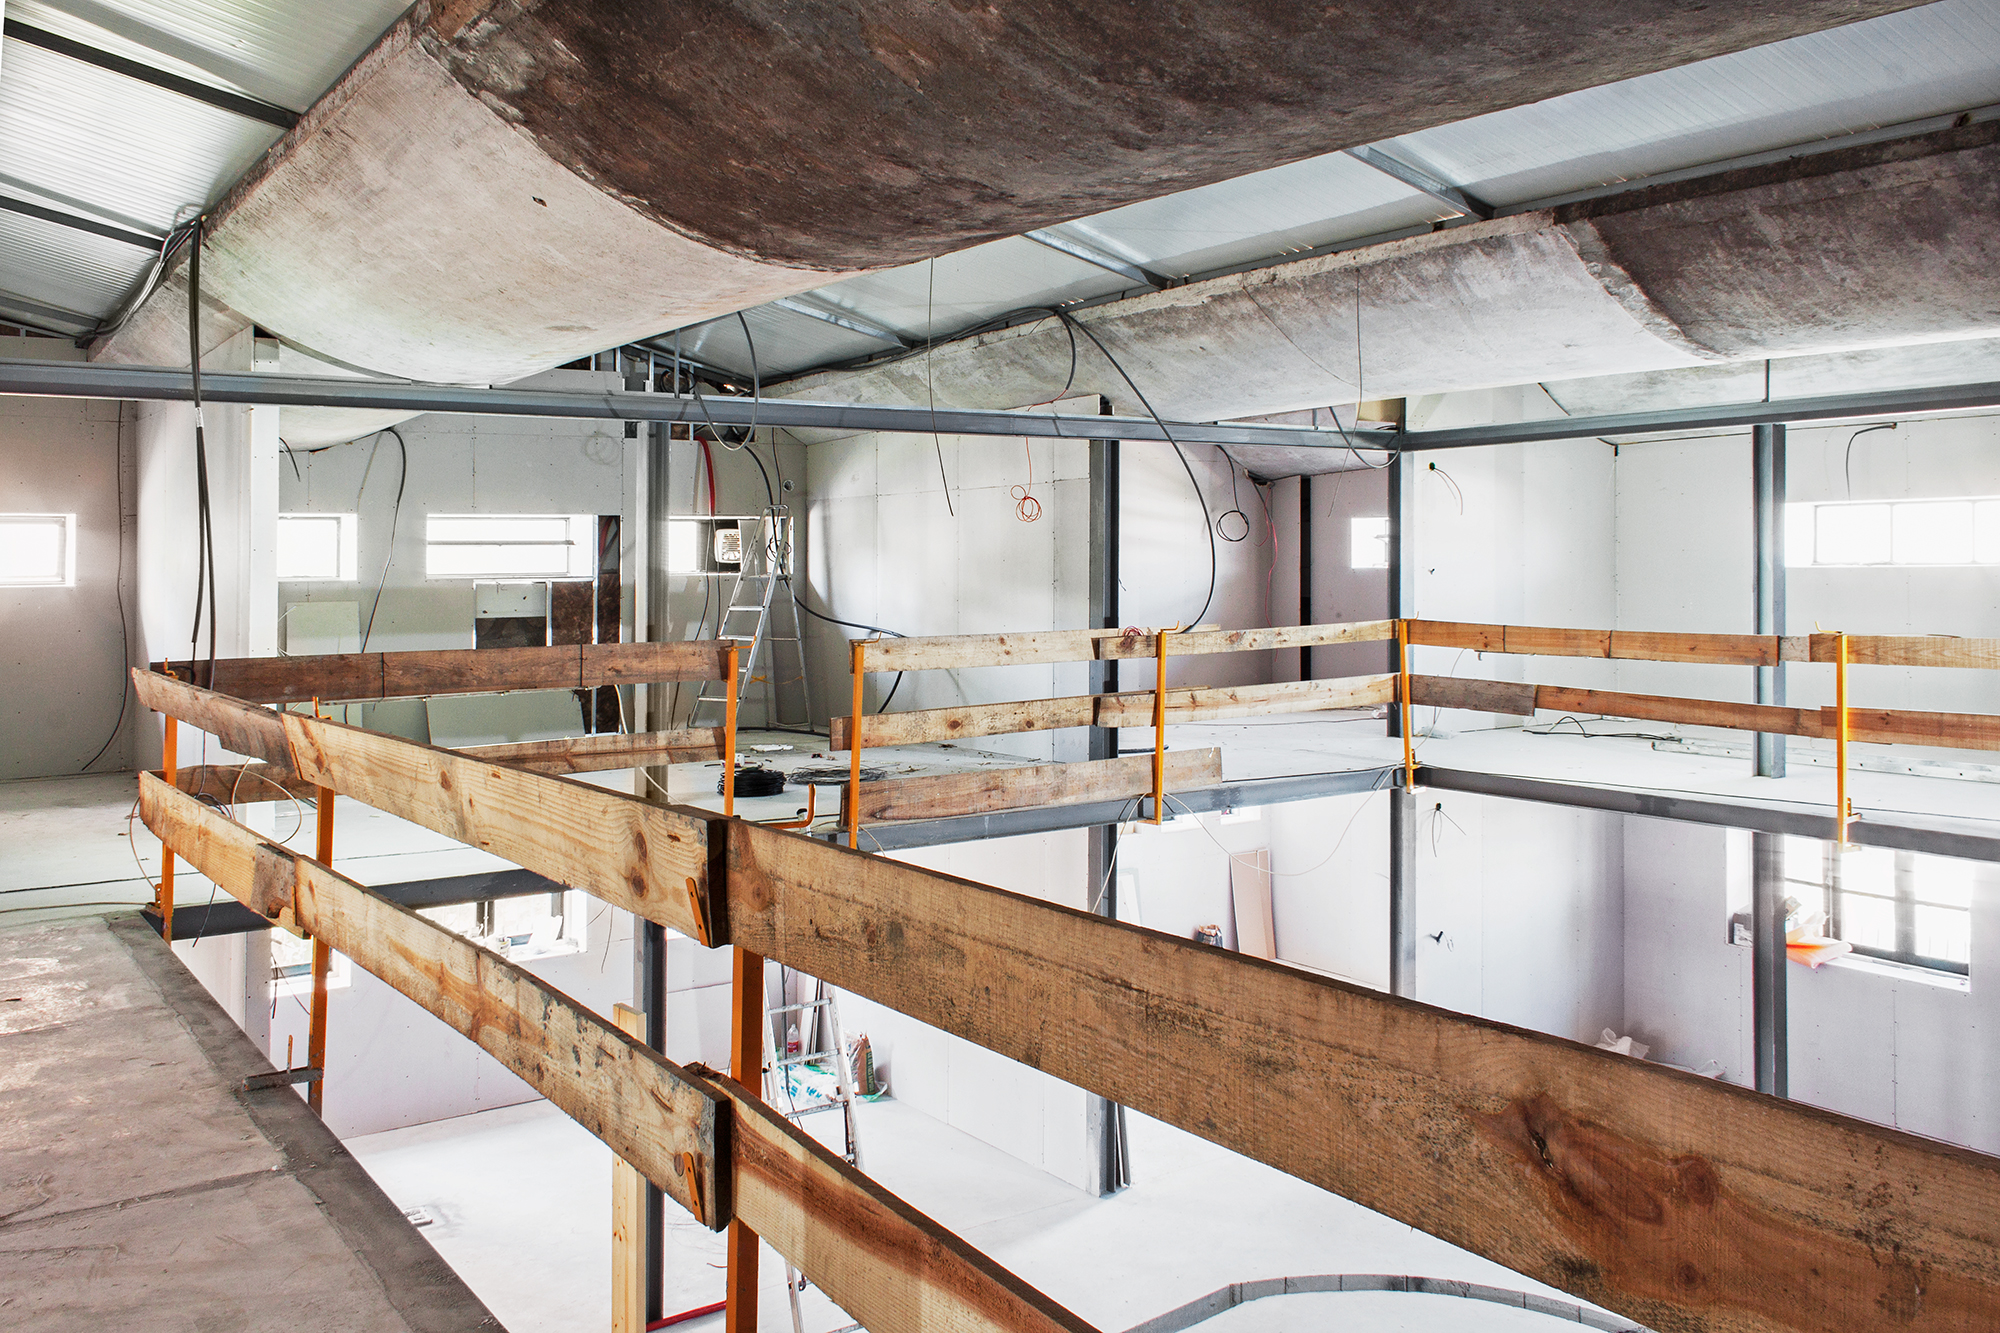 co.working center candal park, rehabilitation phase, 2017